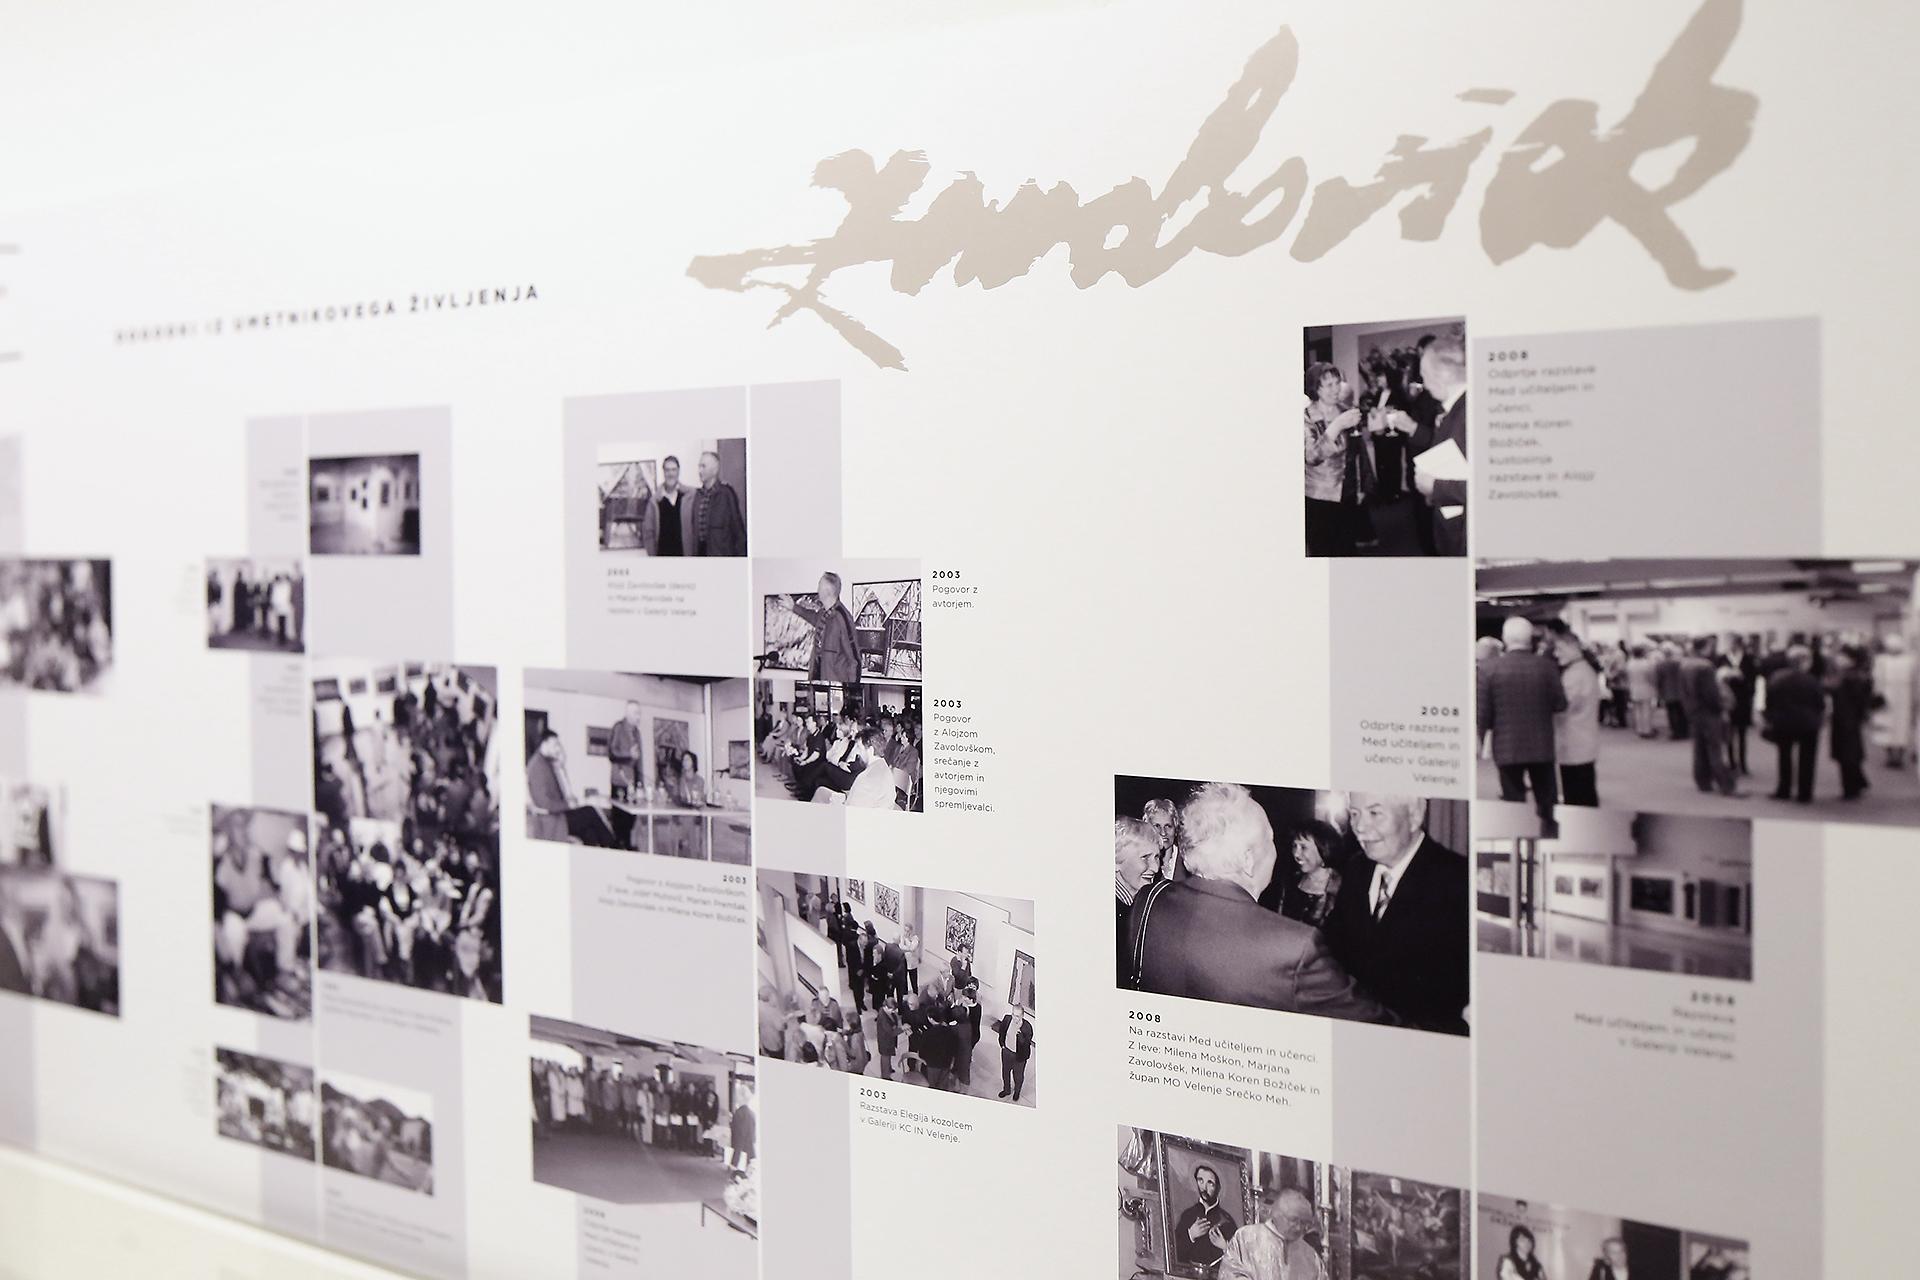 razstava_zavolovsek_galerija_velenje_marko_marinsek_studio_ma-ma_16